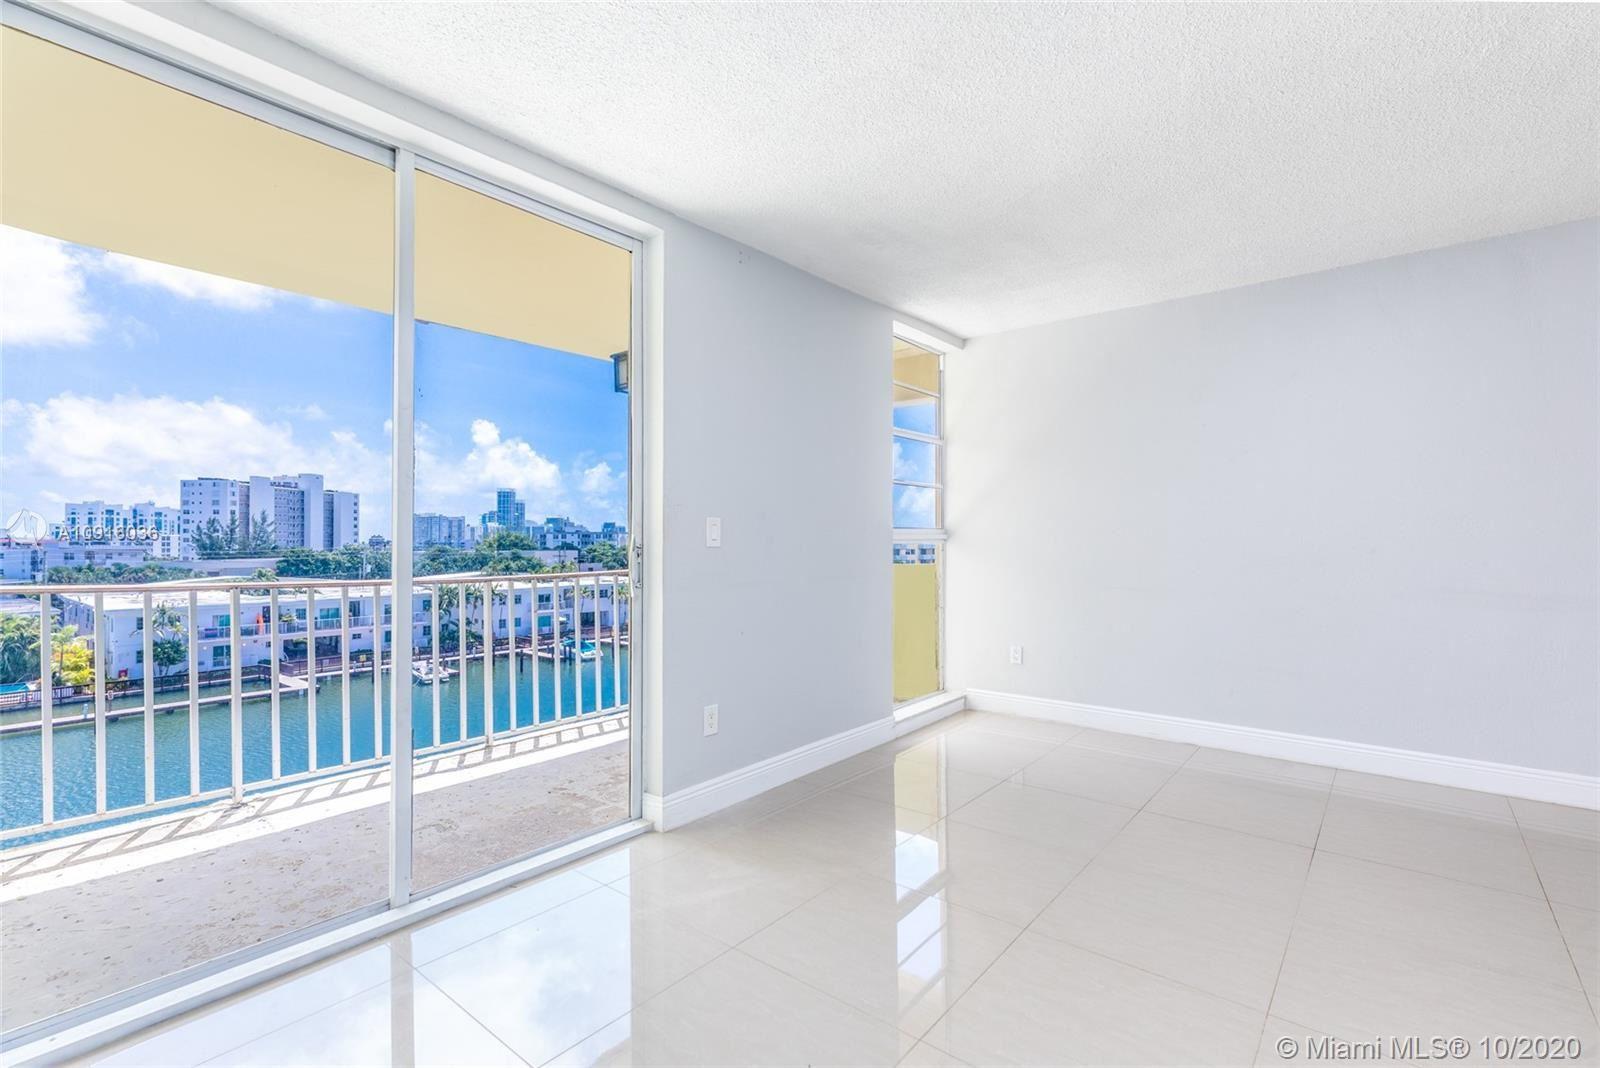 8001 Crespi Blvd #5D, Miami Beach, FL 33141 - #: A10916036